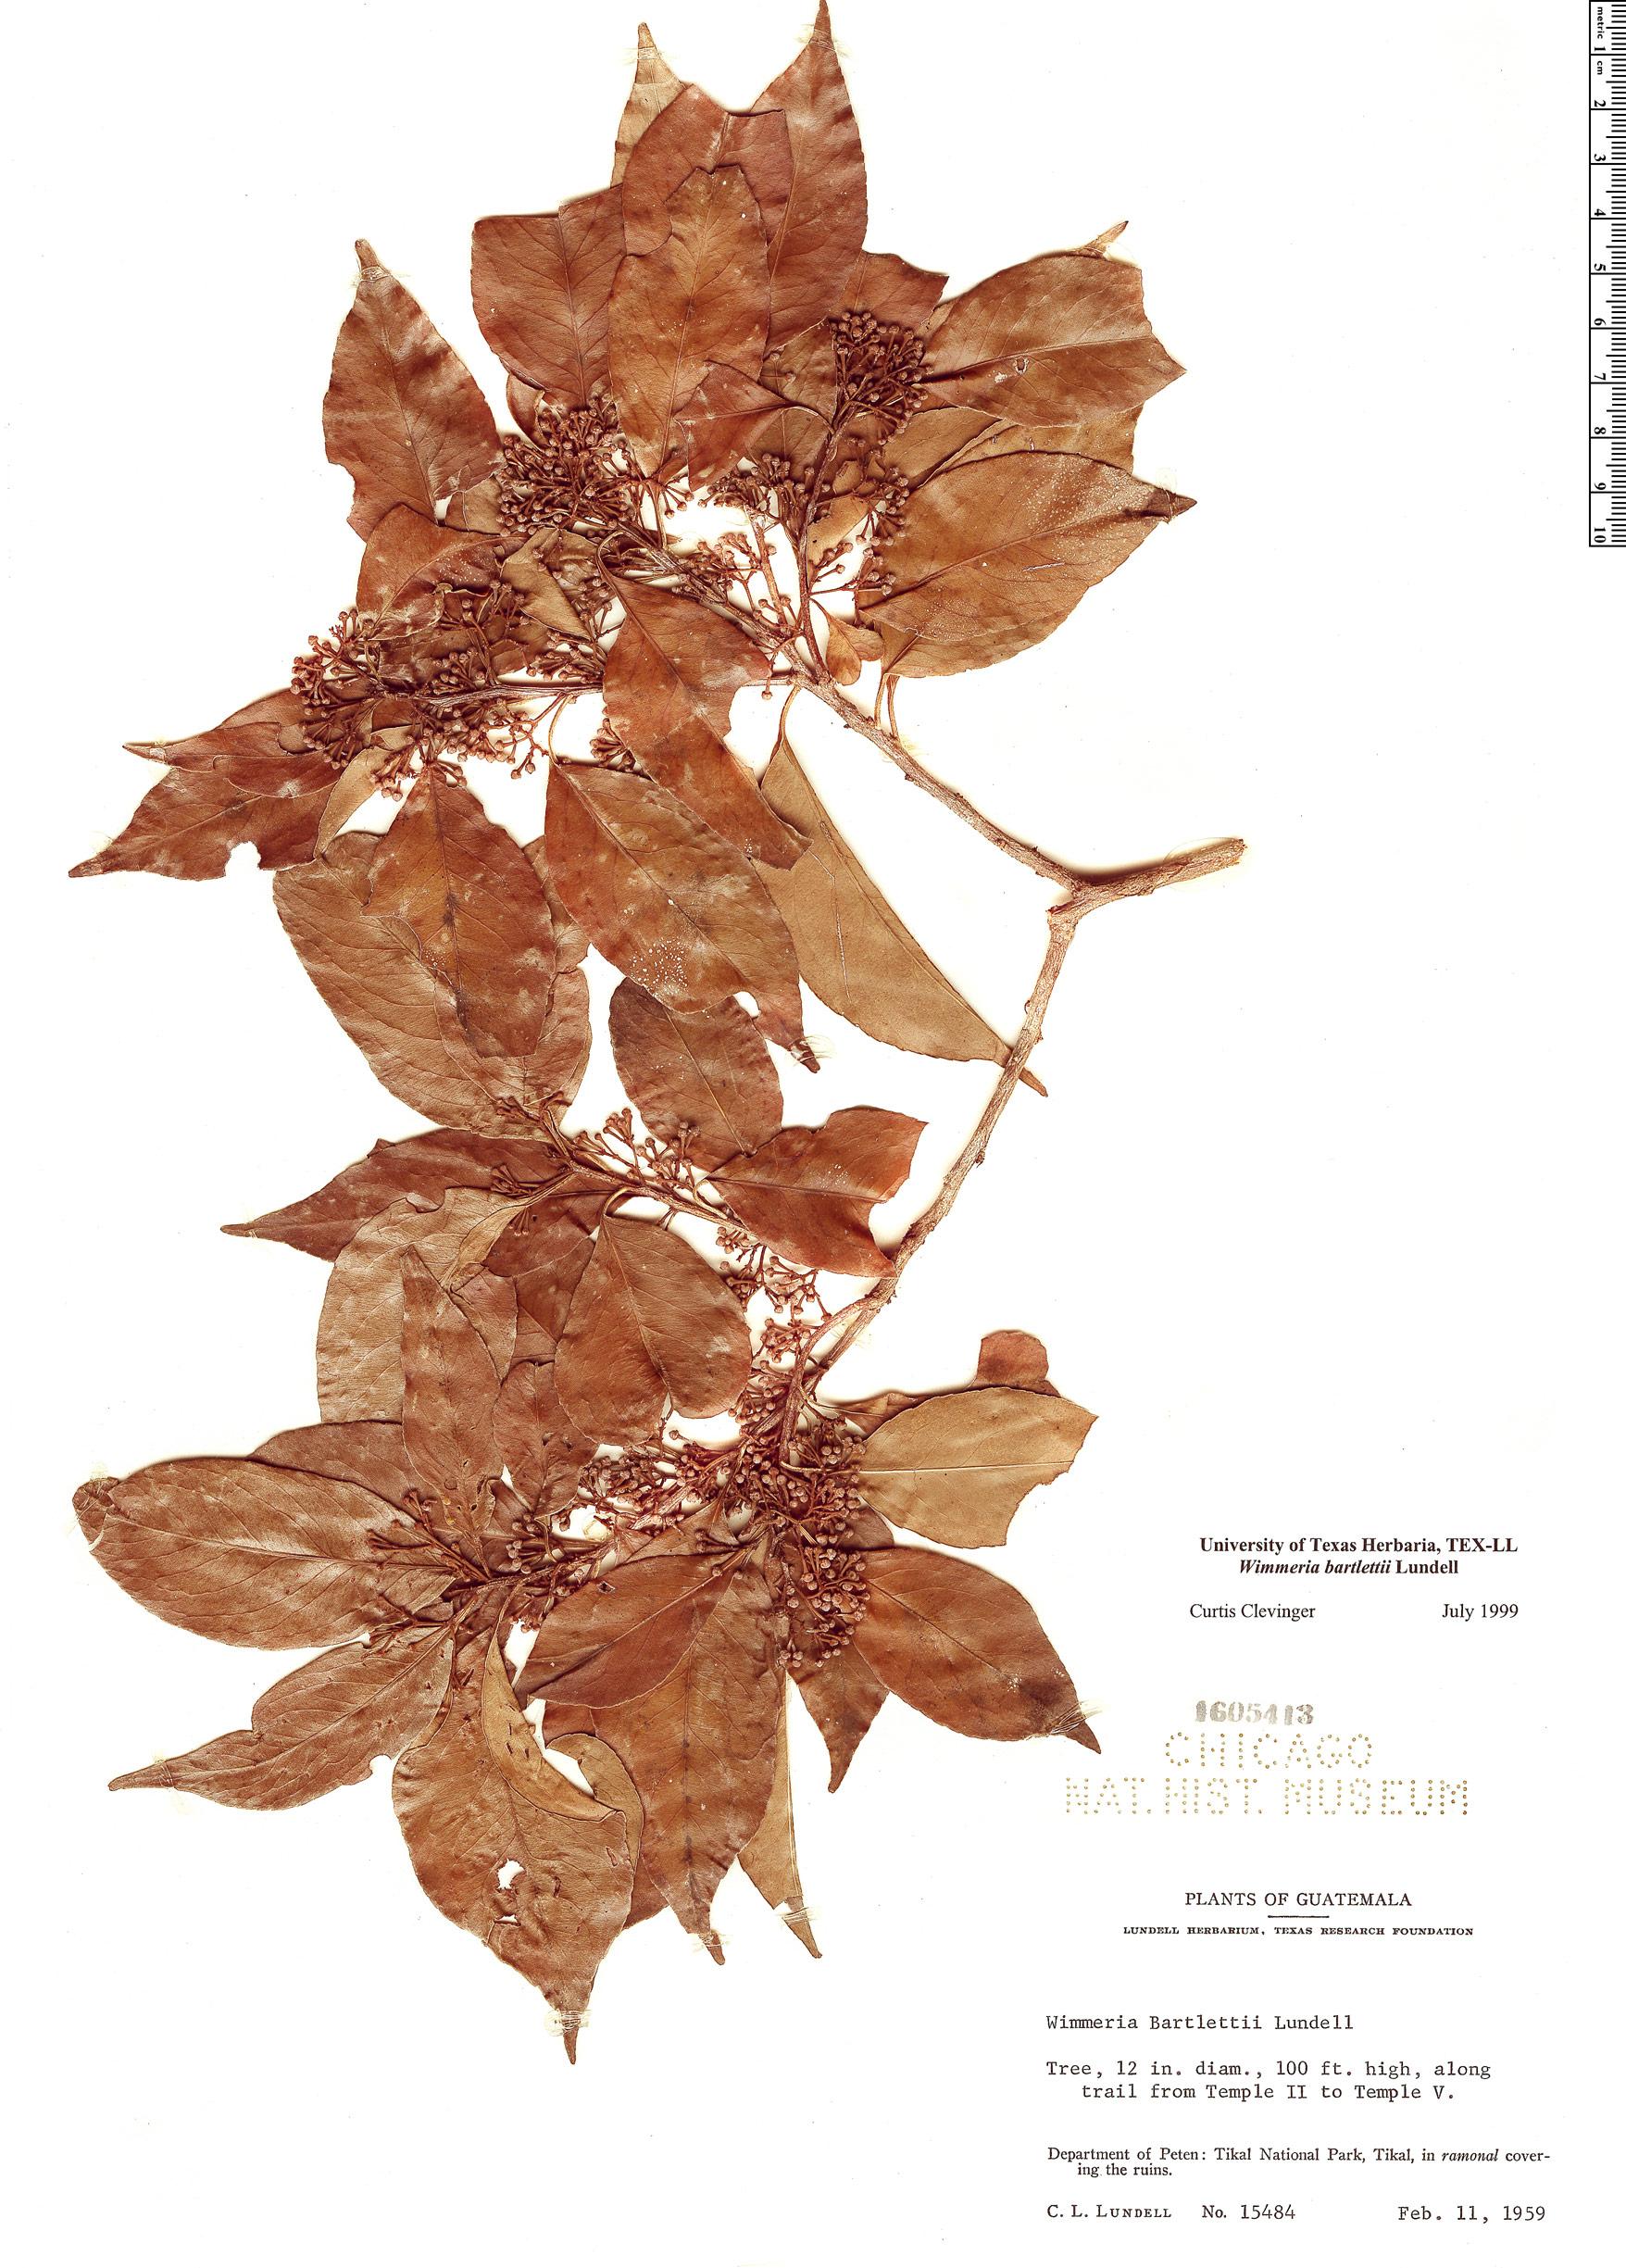 Specimen: Wimmeria bartlettii